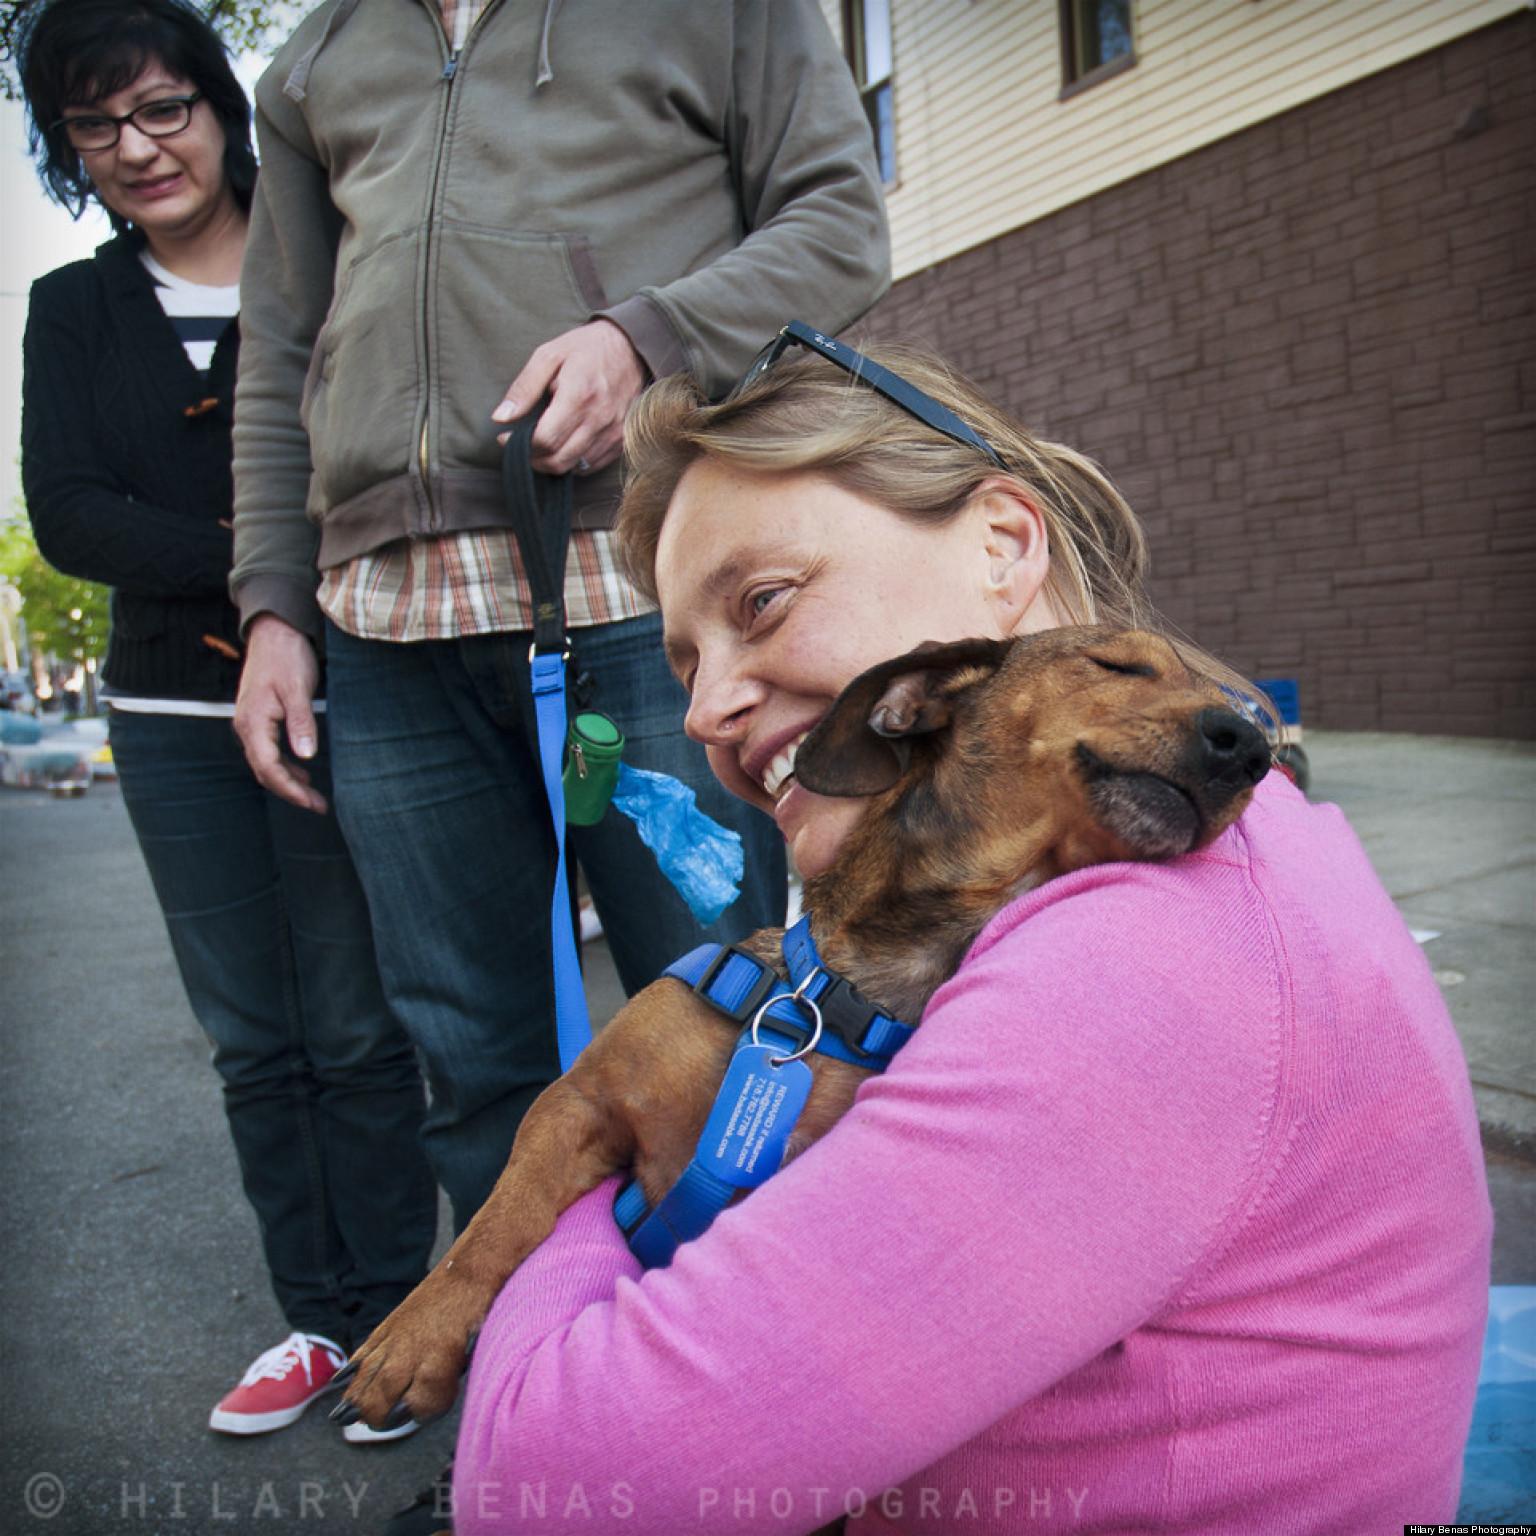 LOOK: This Human-Dog Hug WIll Crush Your Heart